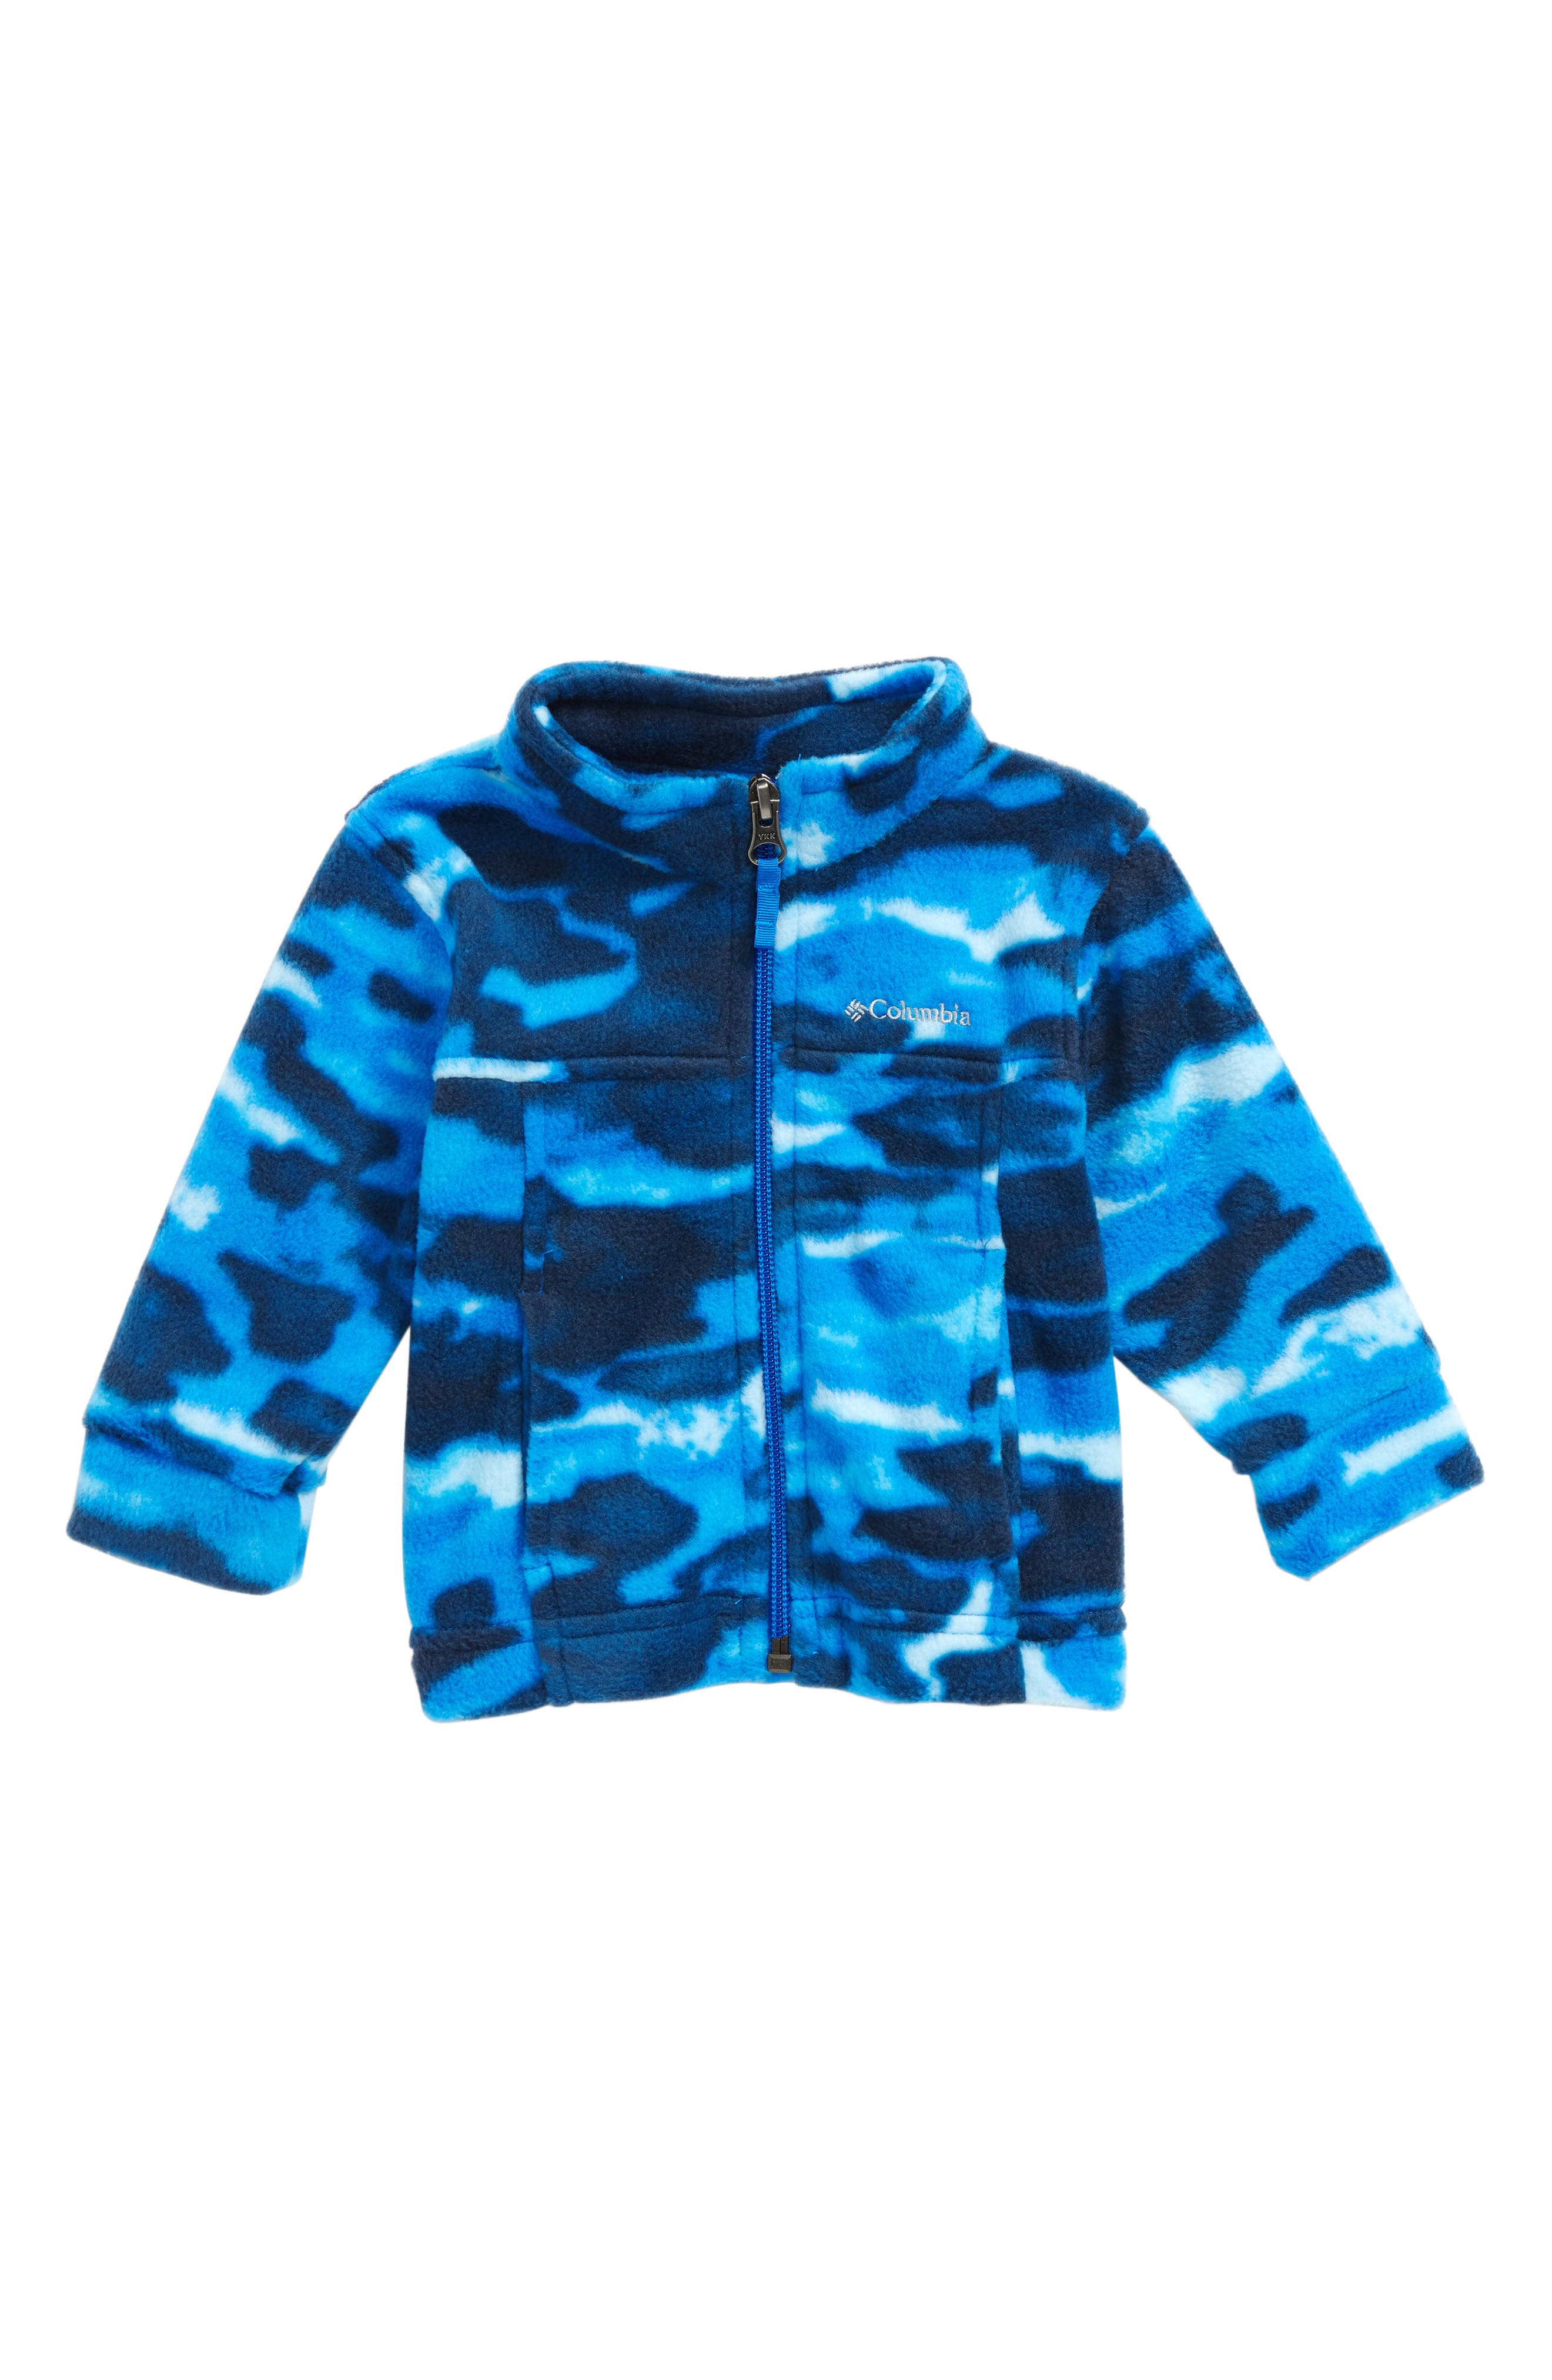 Zing III Fleece Jacket,                         Main,                         color, Super Blue Camo